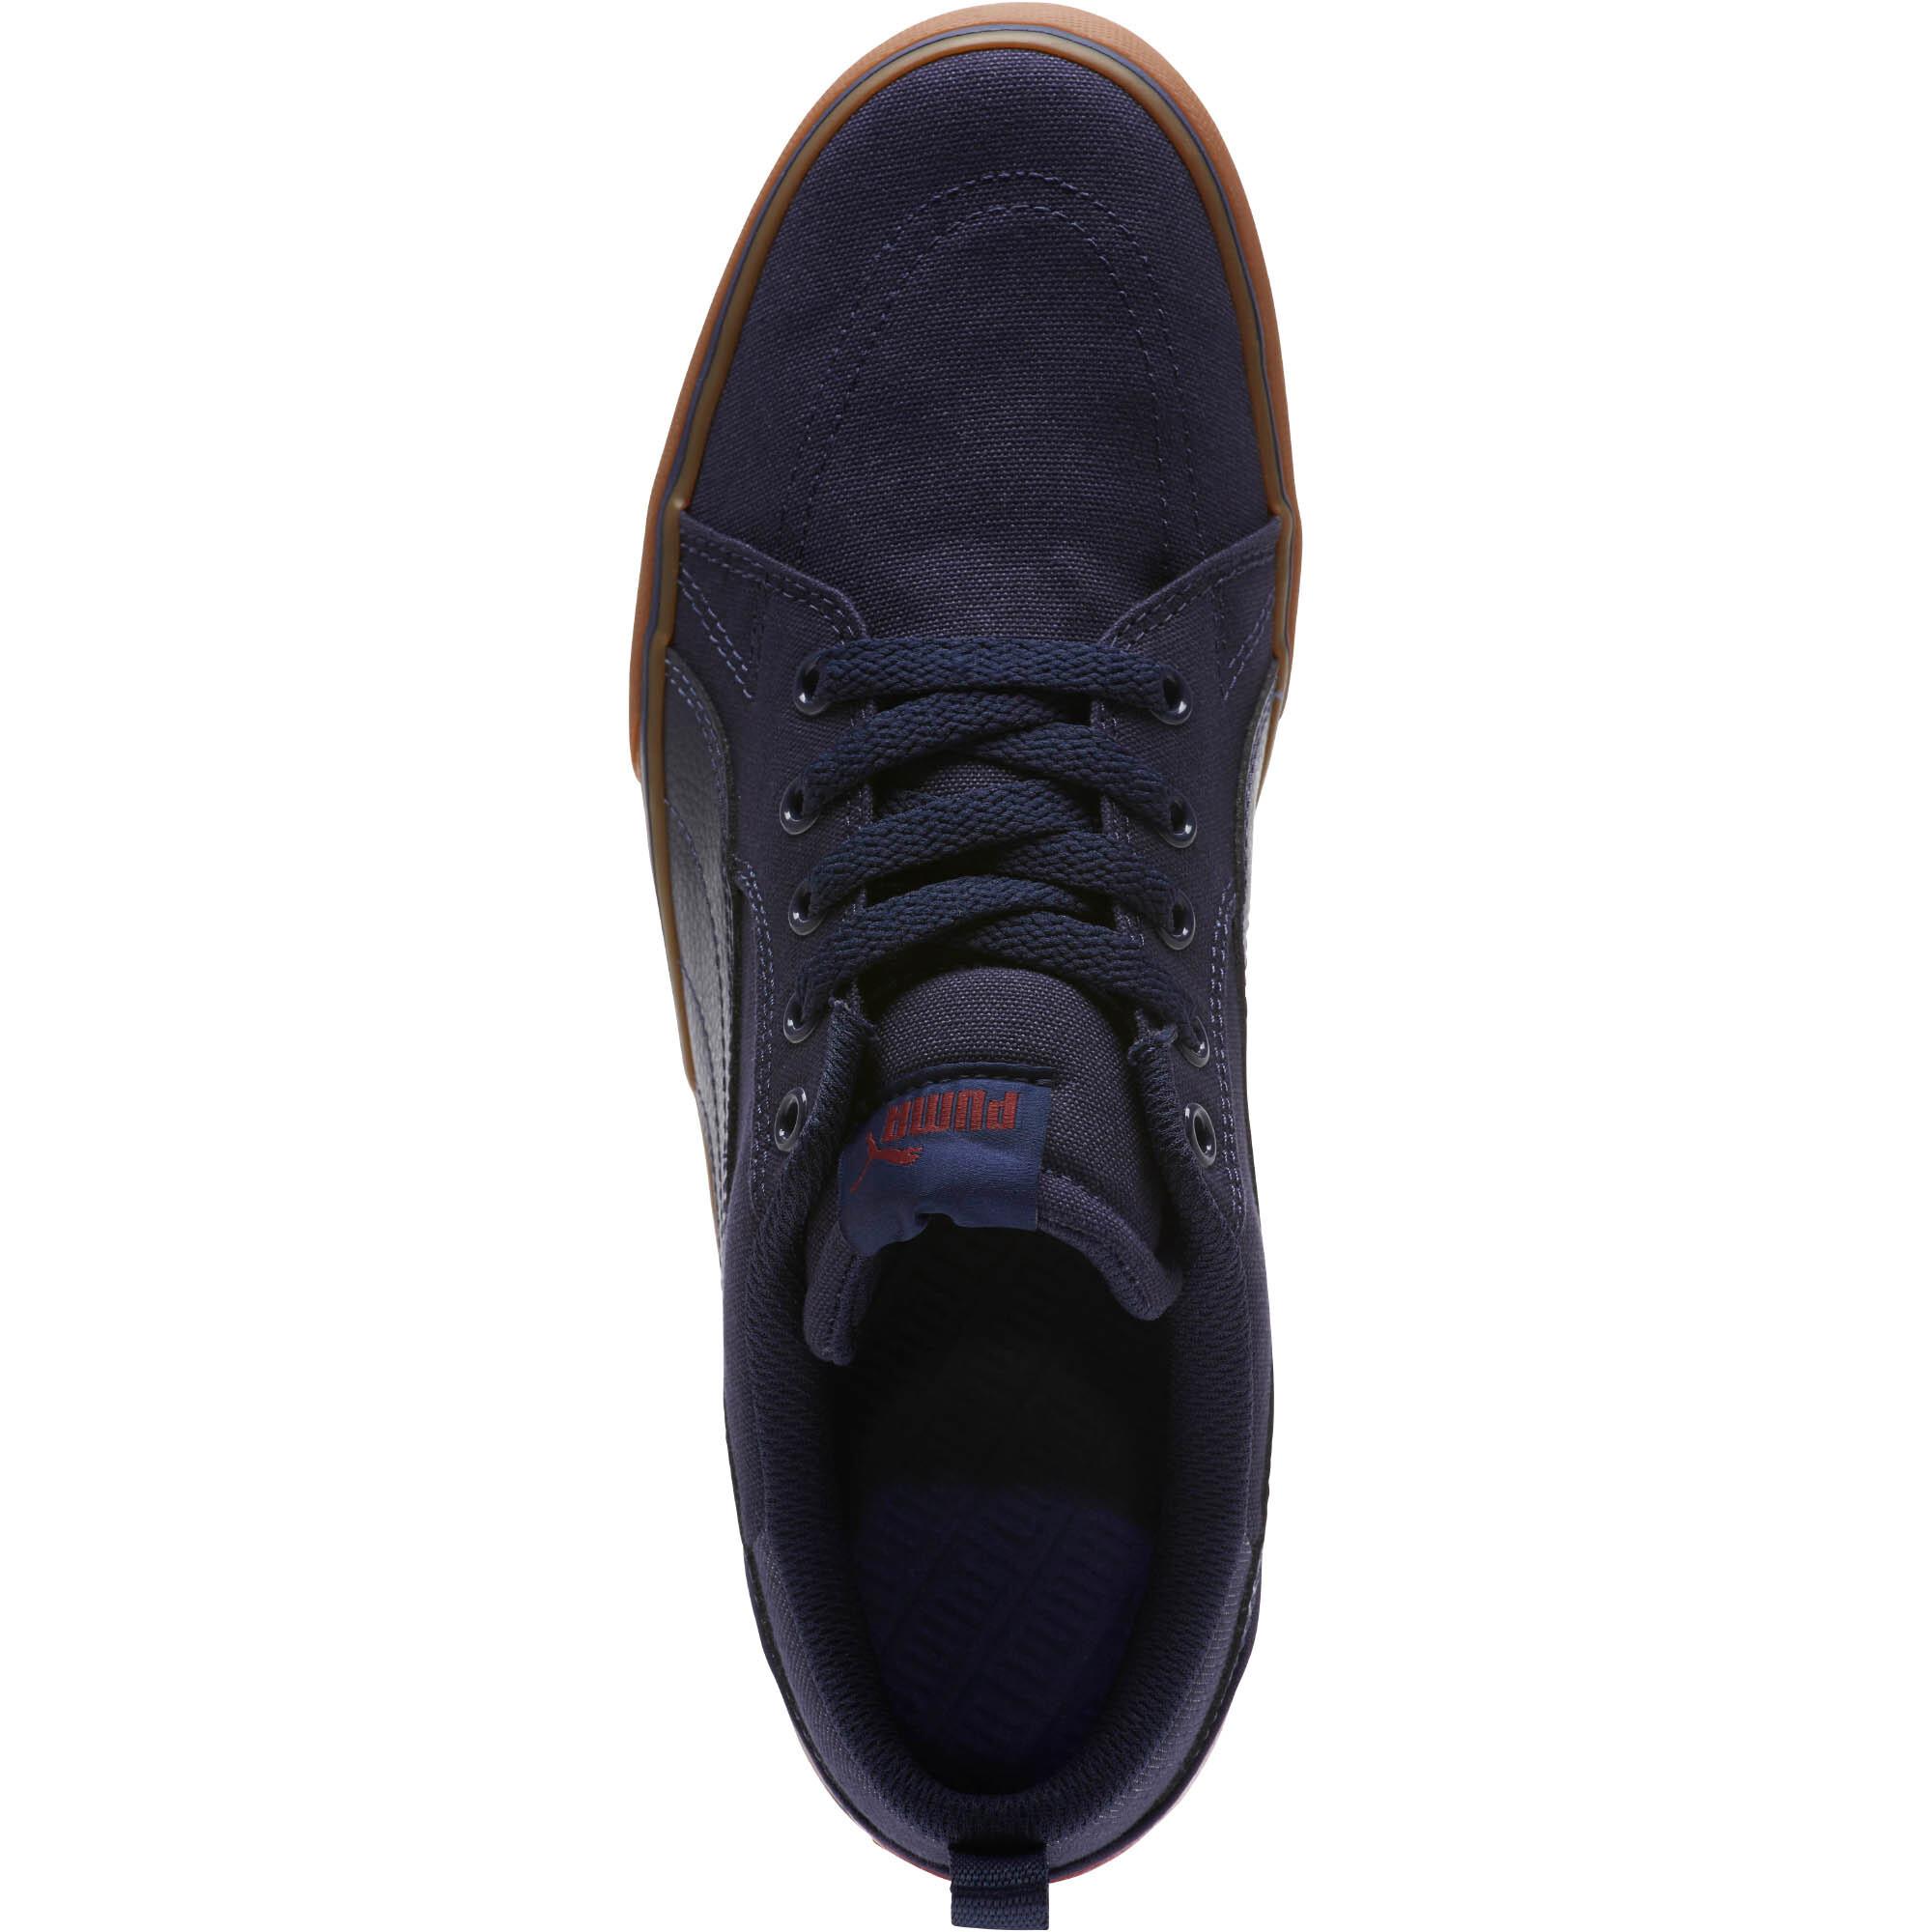 PUMA-PUMA-Bridger-Men-039-s-Sneakers-Men-Shoe-Basics thumbnail 17